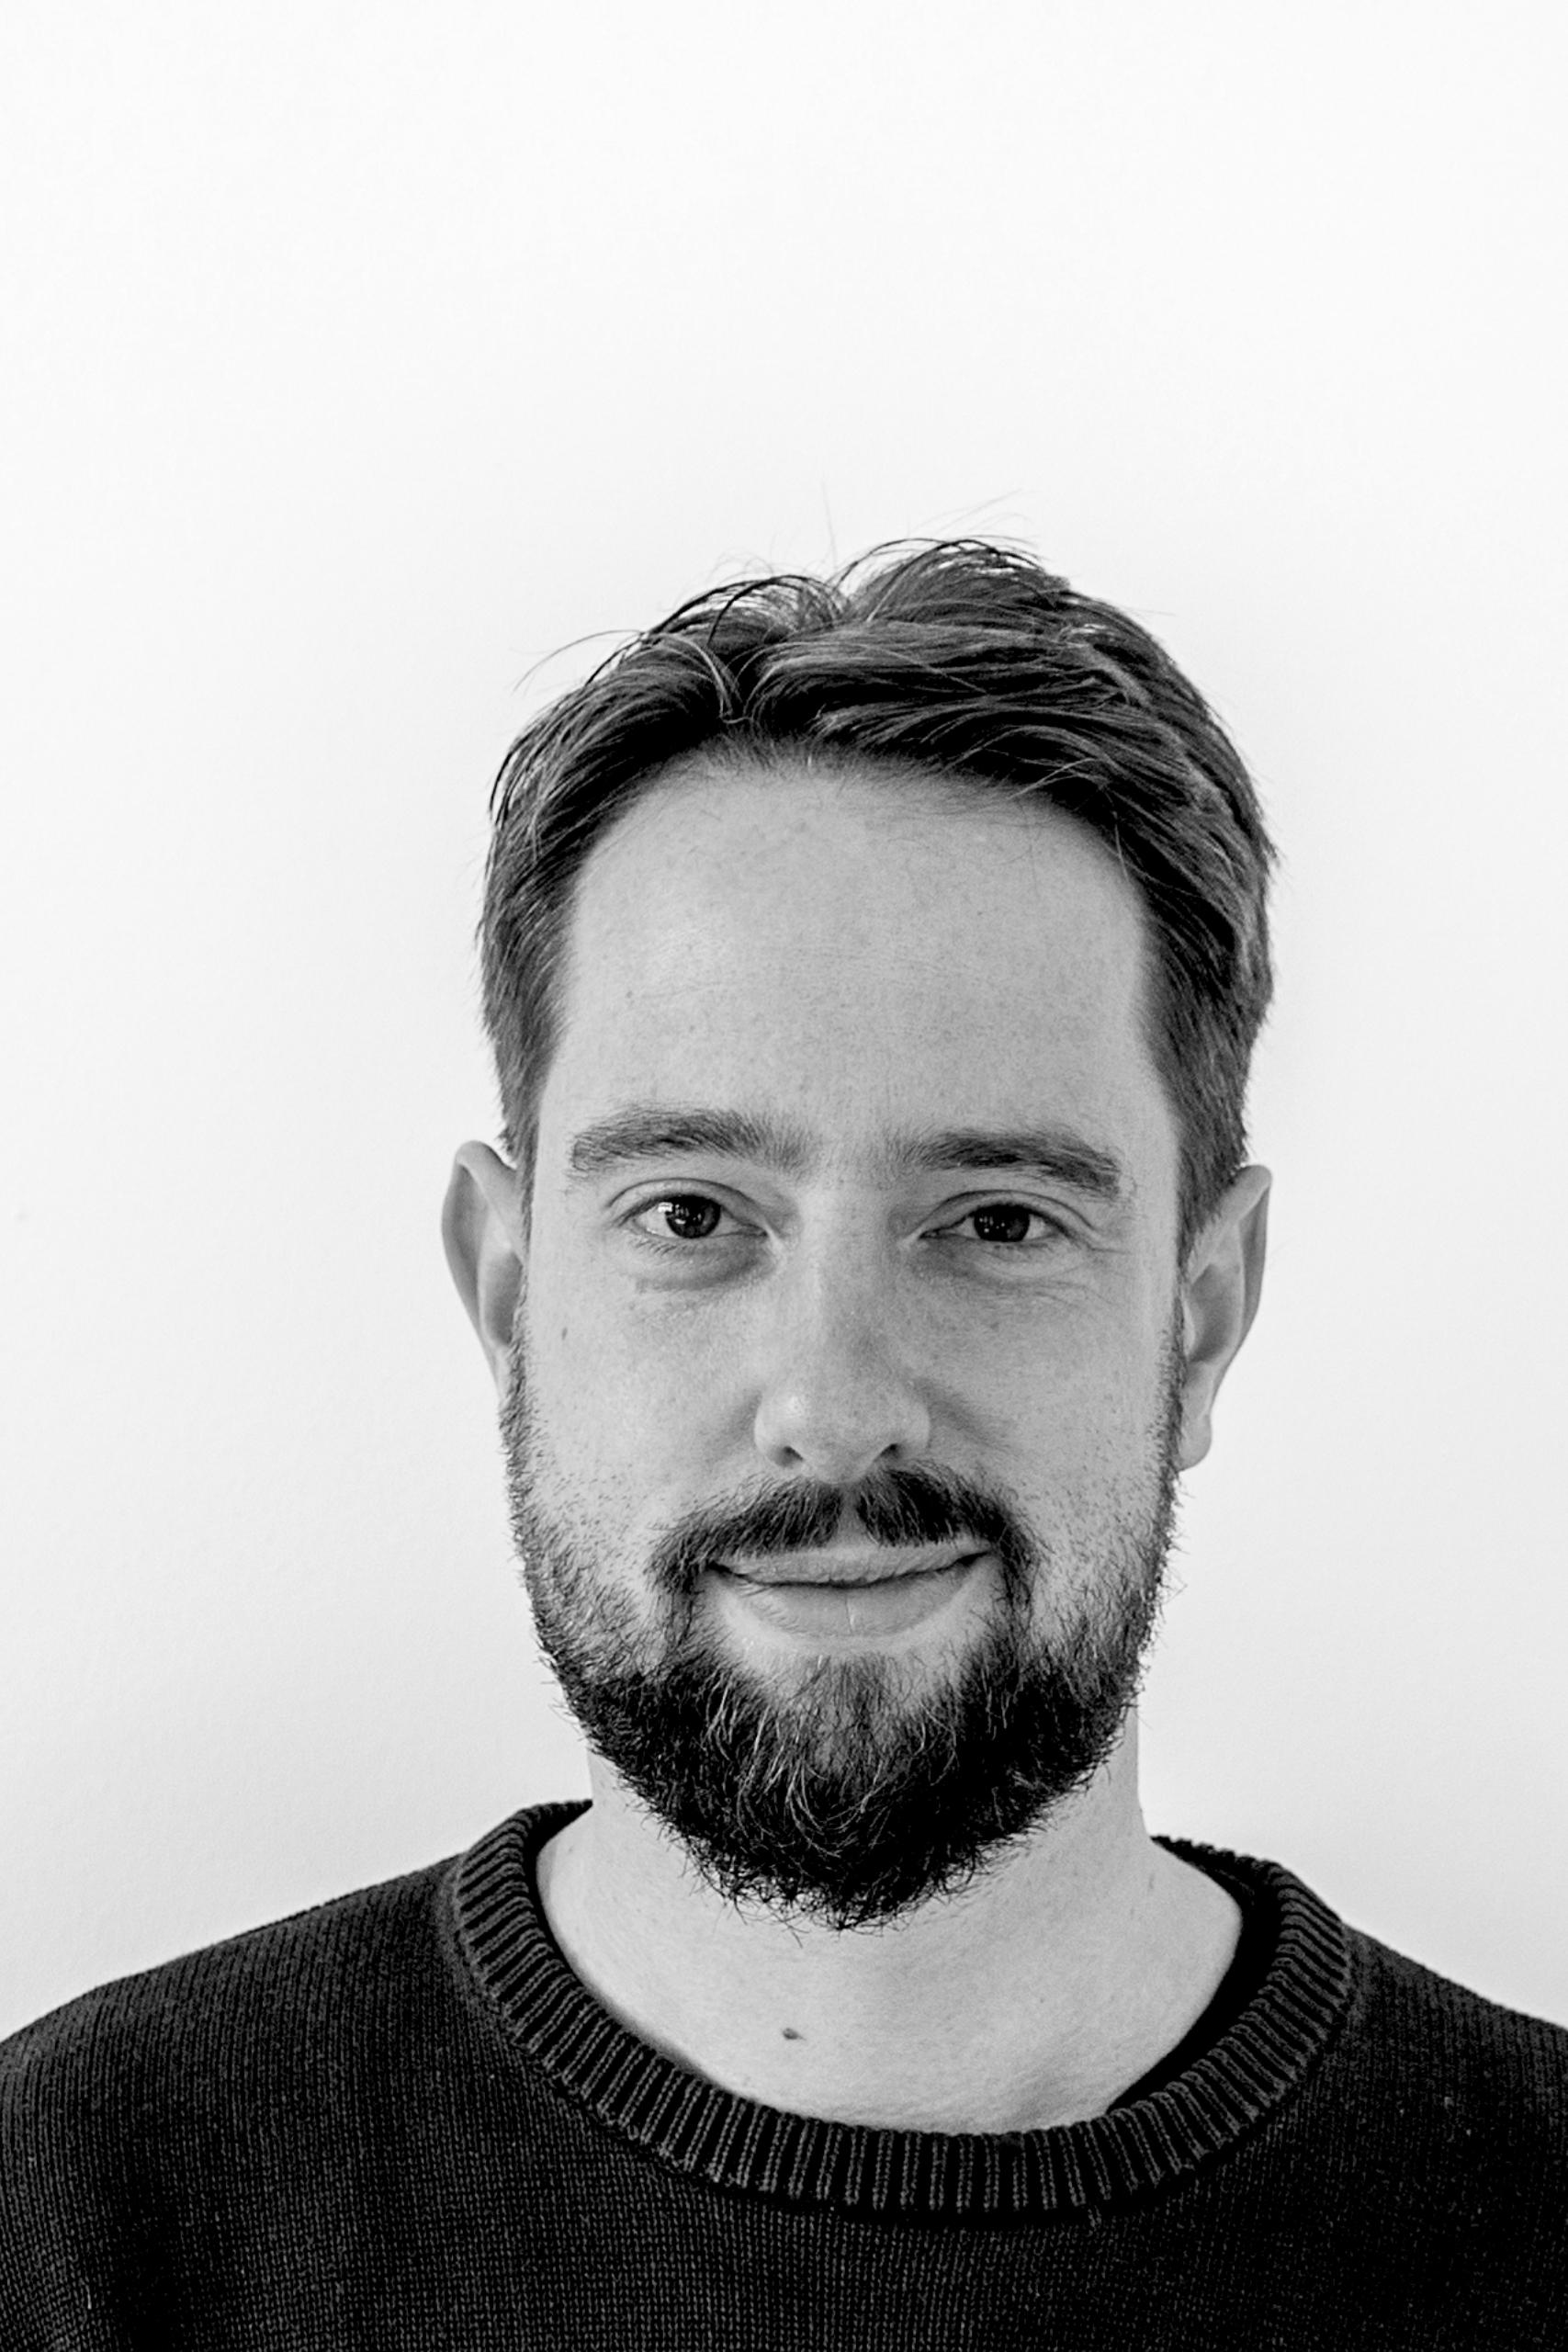 Portraitfoto von Julian Kauke